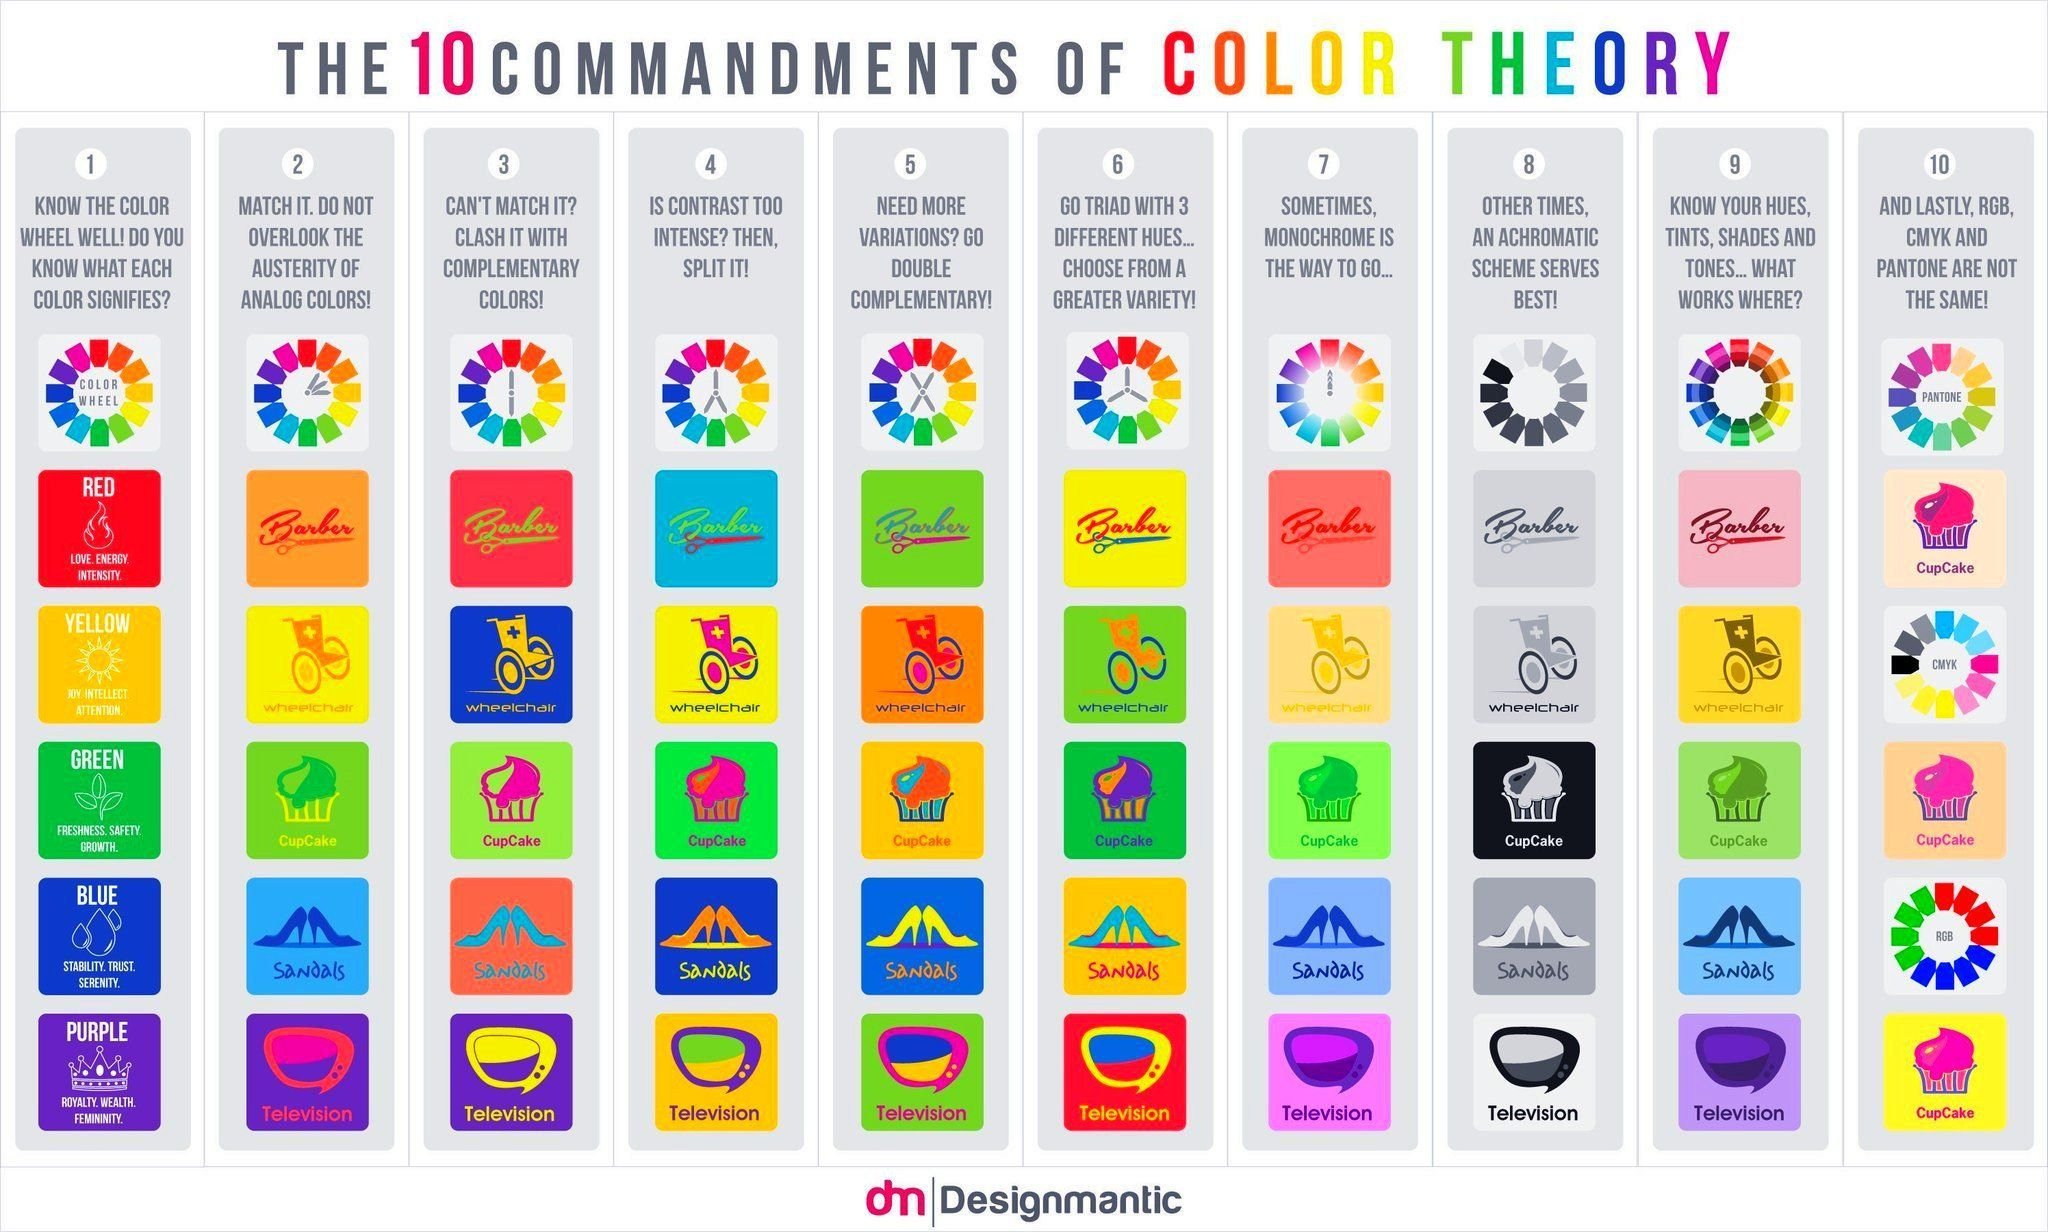 The 10 commandments of color theory. #Branding #Marketing #Brand #DigitalMarketing #Brands Via @CROsnap https://t.co/6v9jinBK9a